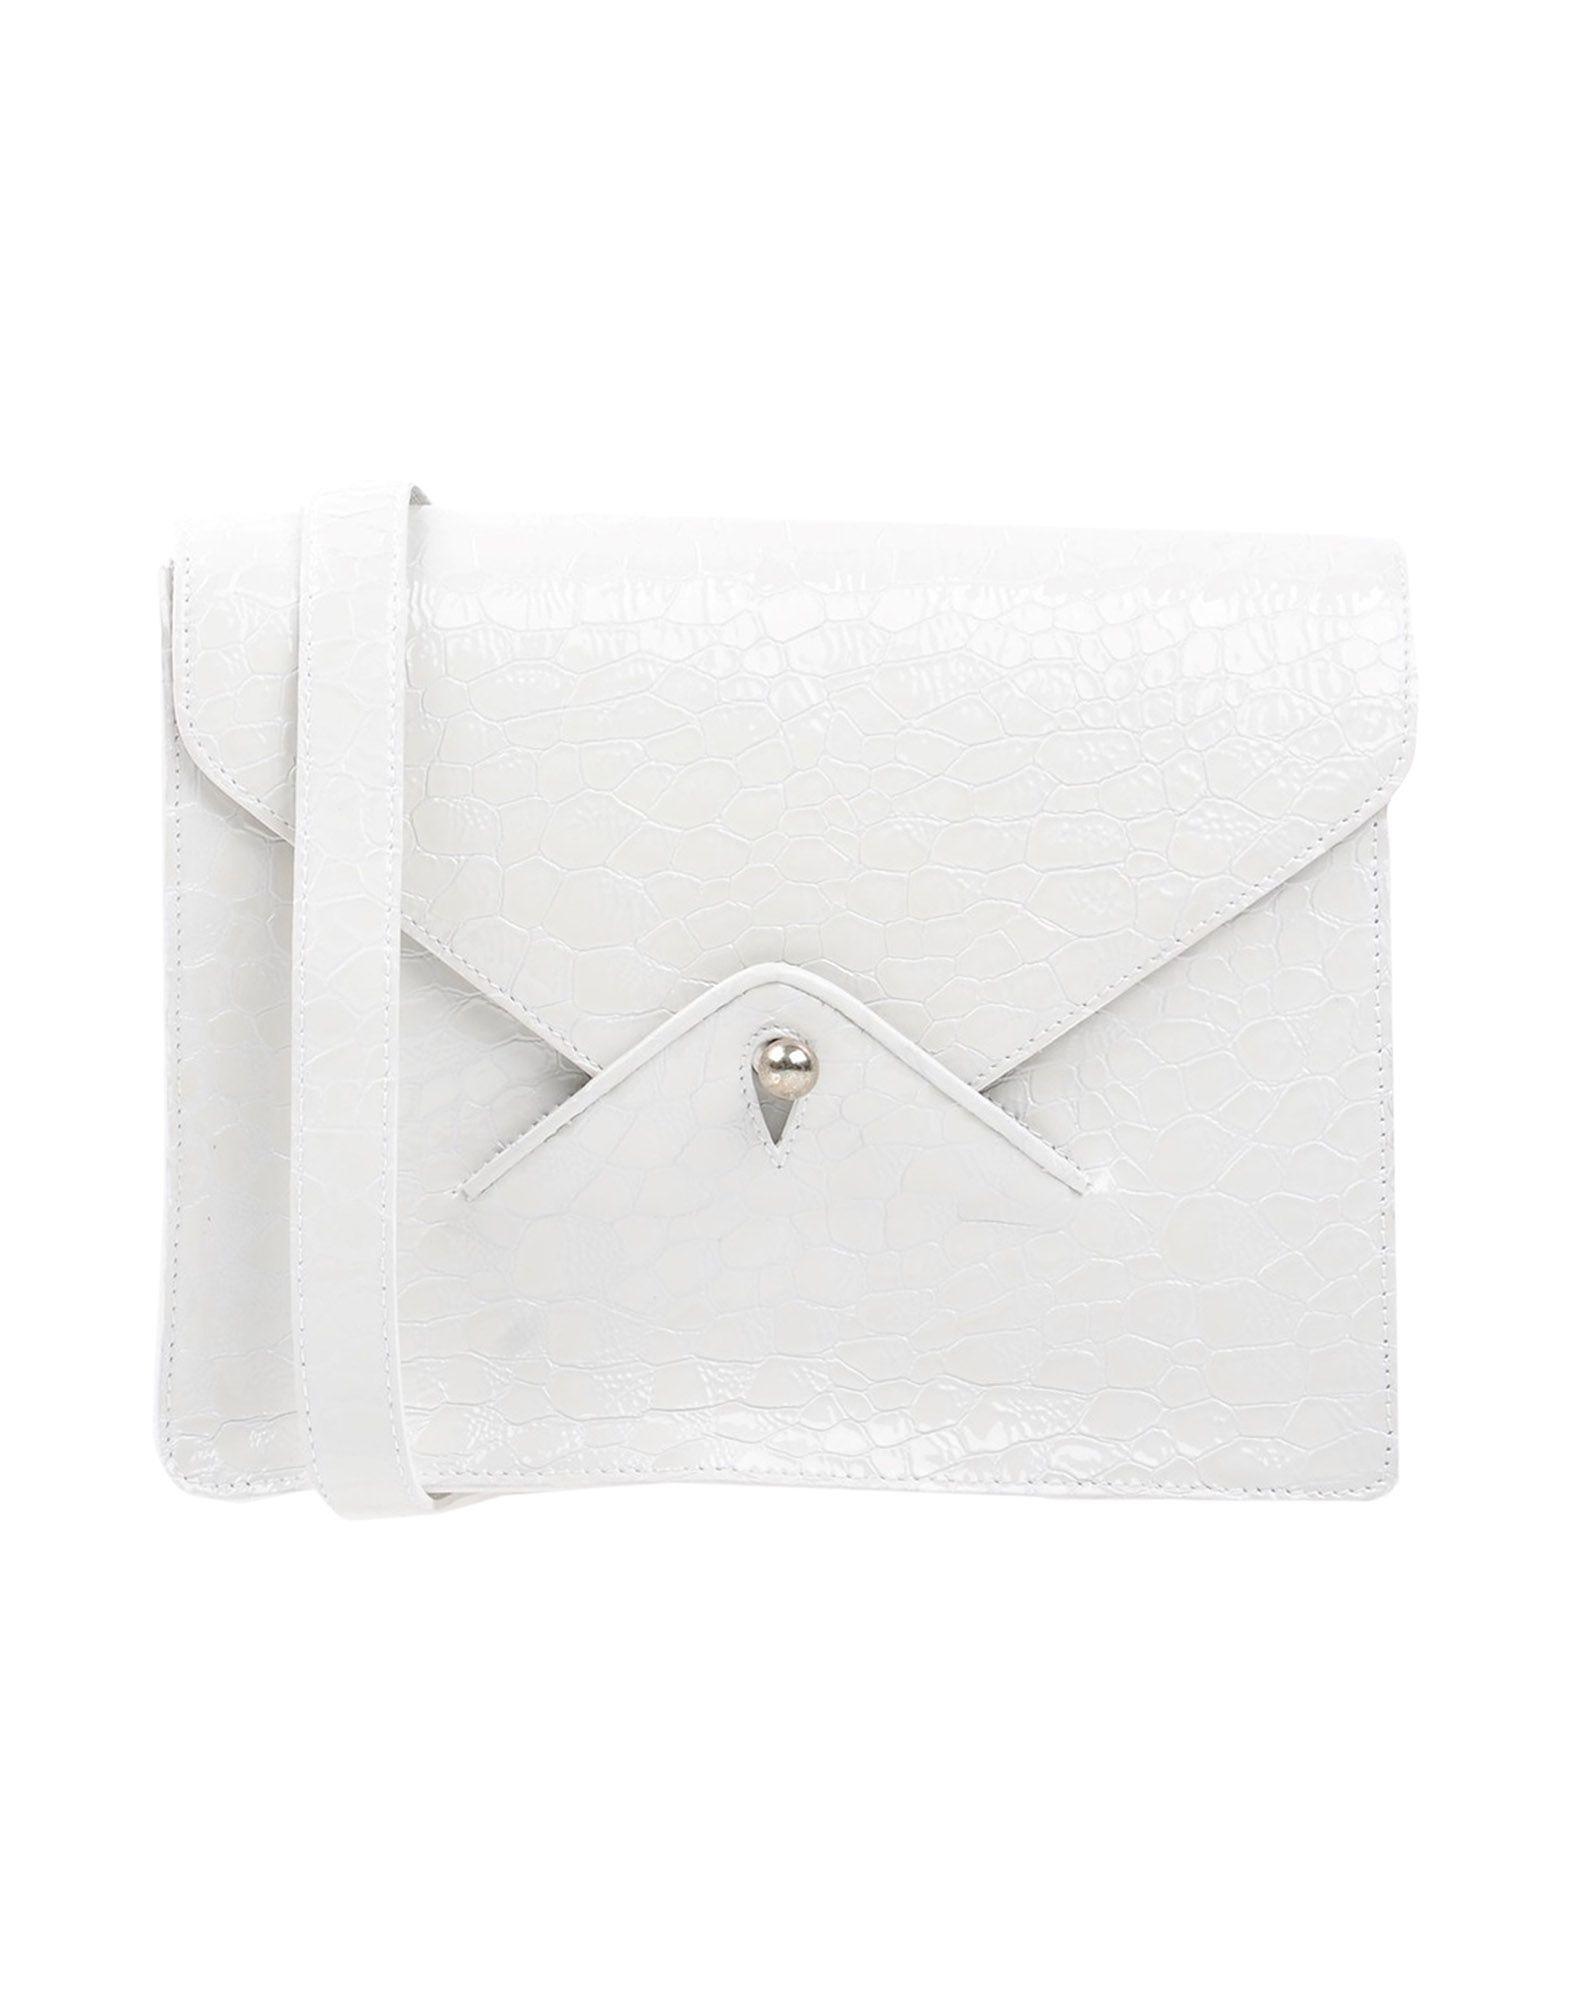 PAUL & JOE Сумка через плечо сумка wei emperor paul wd 23 2014